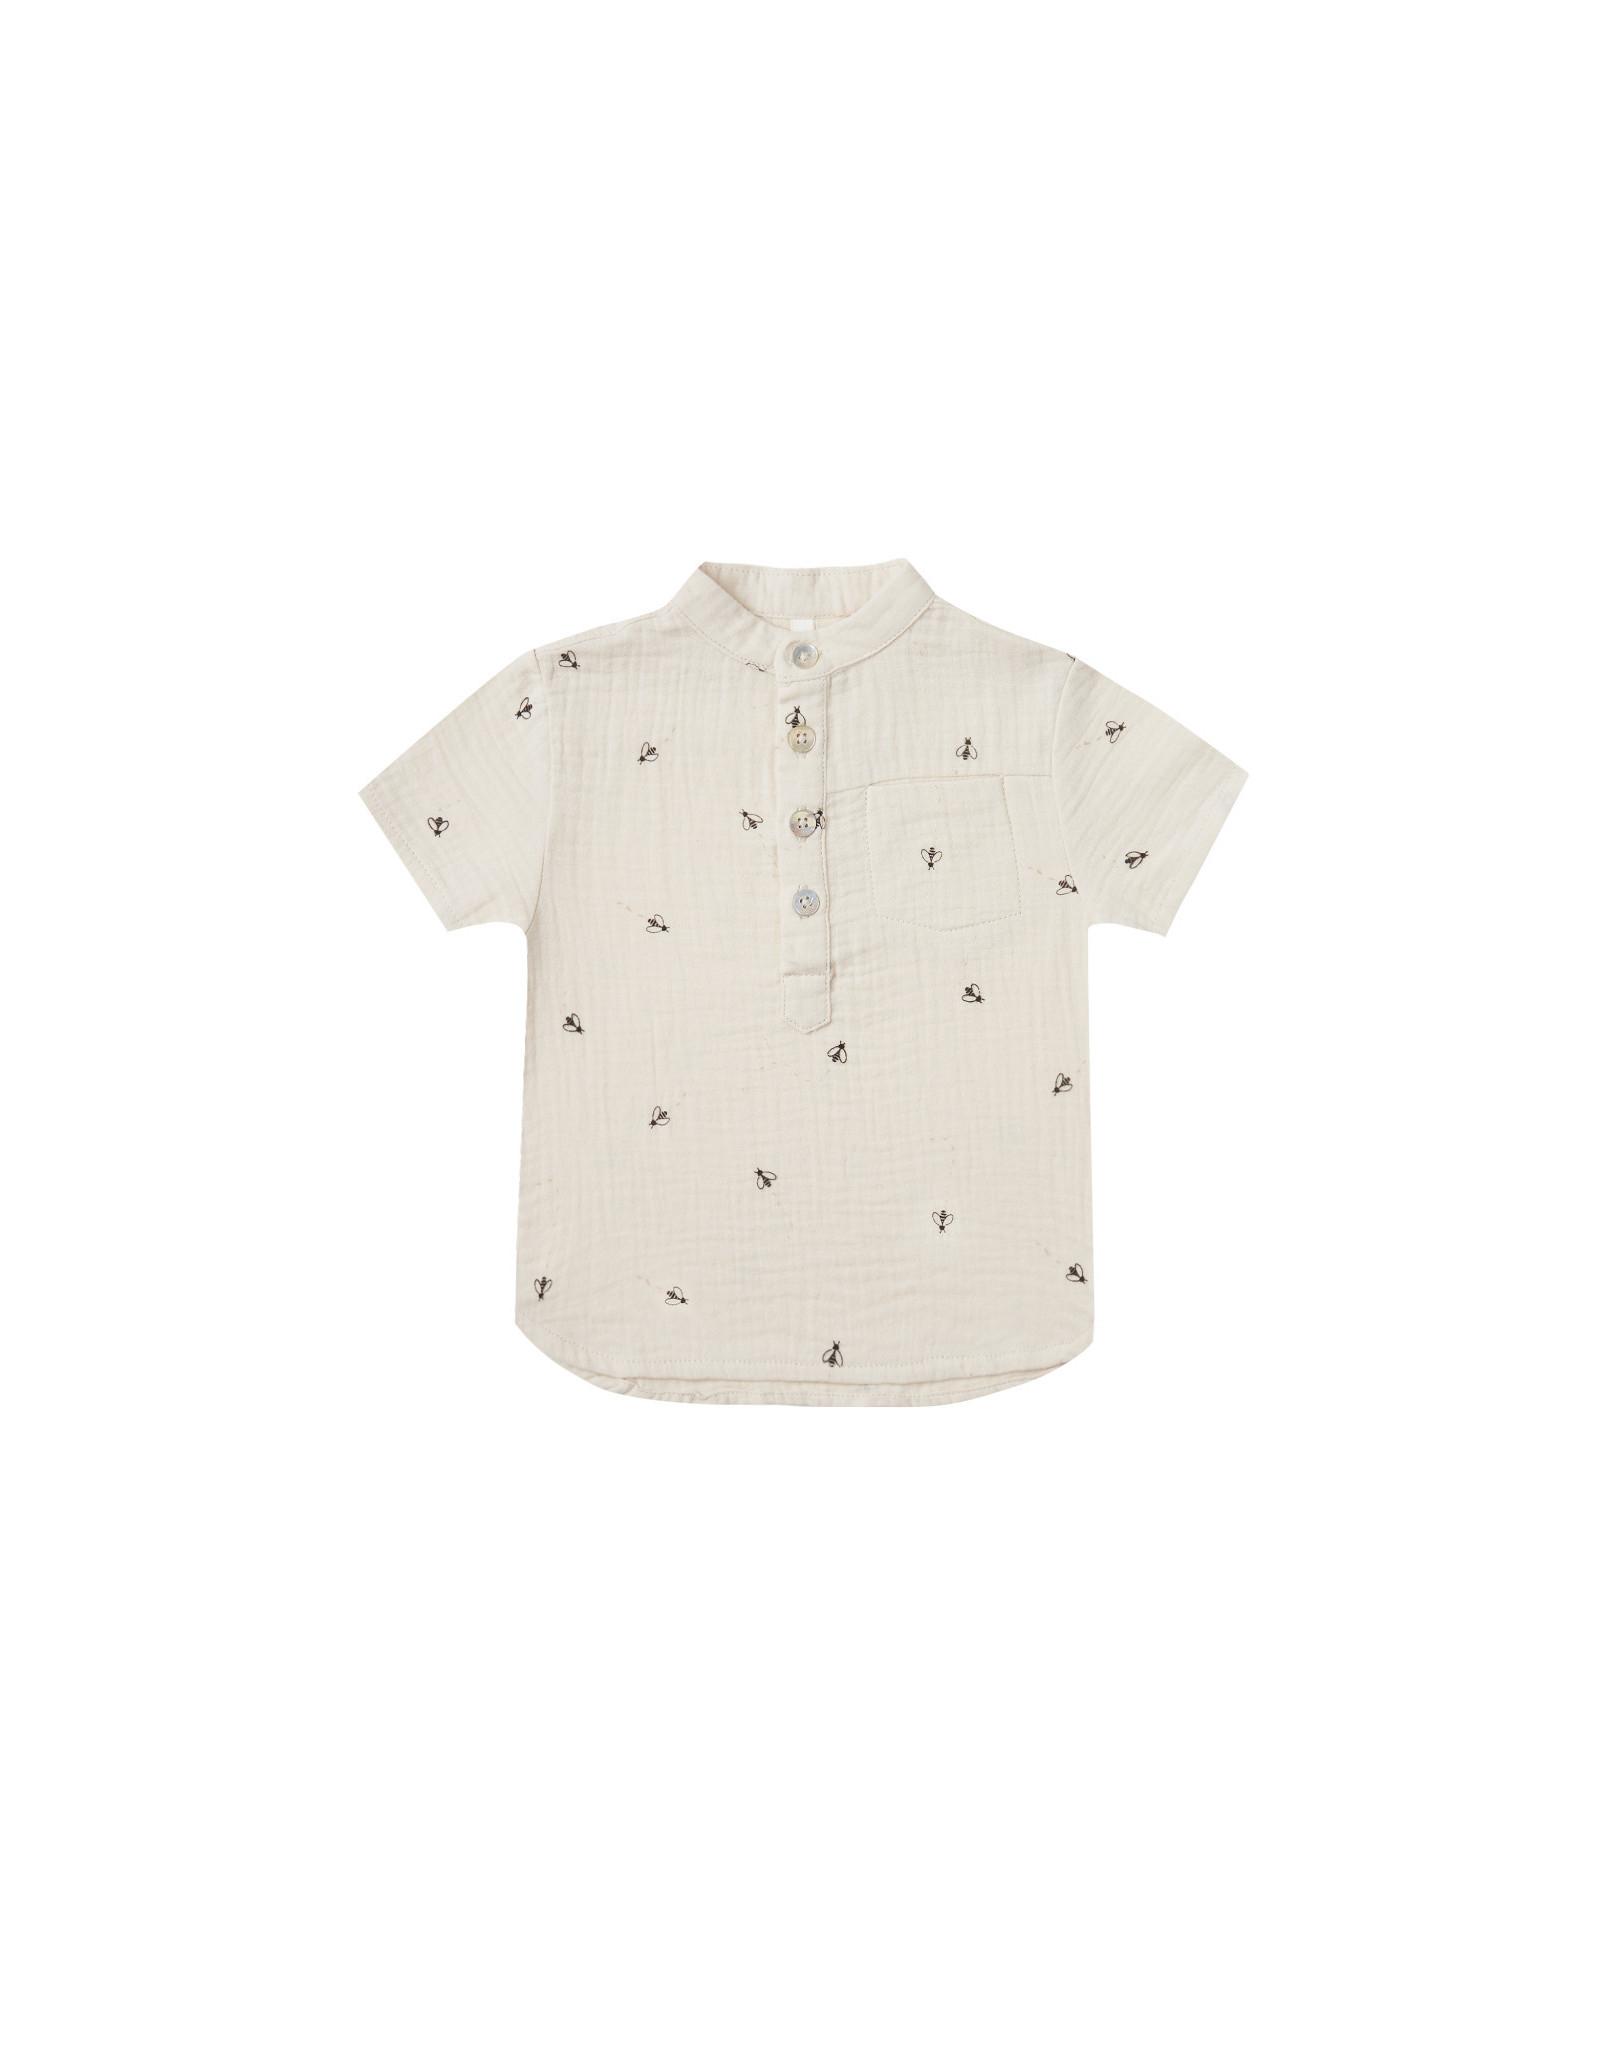 Rylee + Cru Bees Short Sleeve Mason Shirt